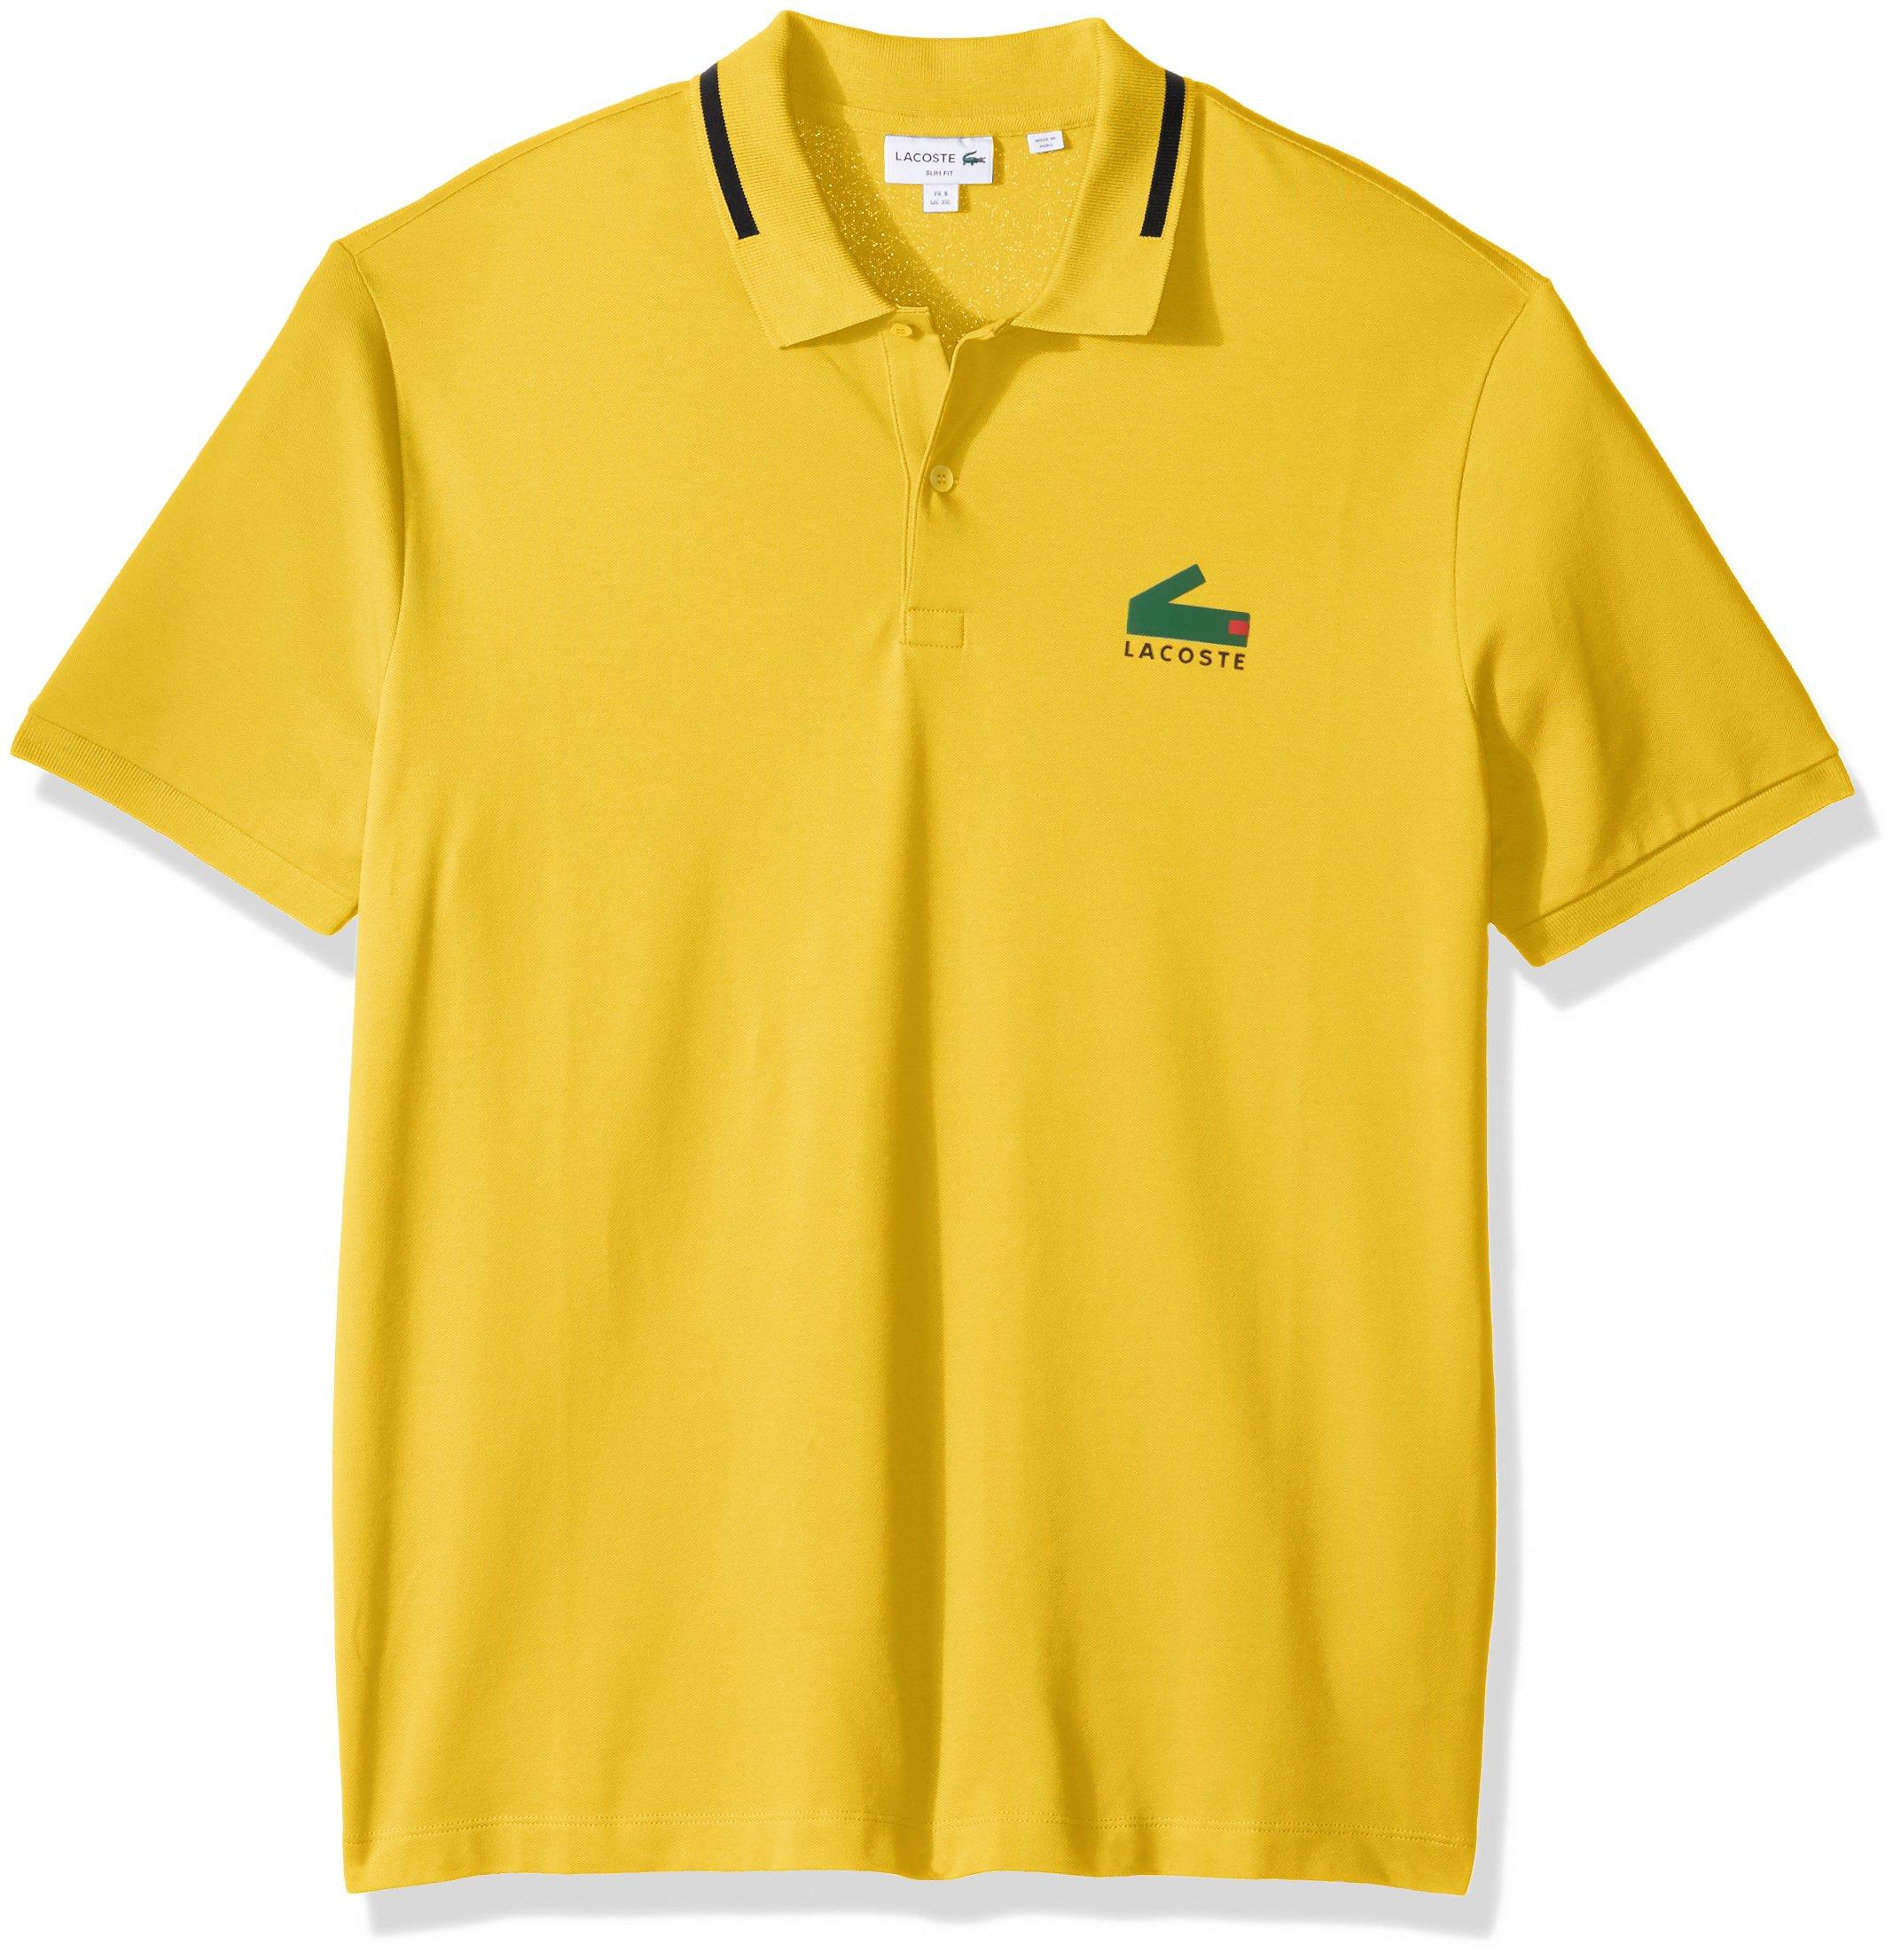 Lacoste Men's Short Sleeve Graphic Pique Polo With Printed Croc Logo, Calcutta Yellow/Black, 9